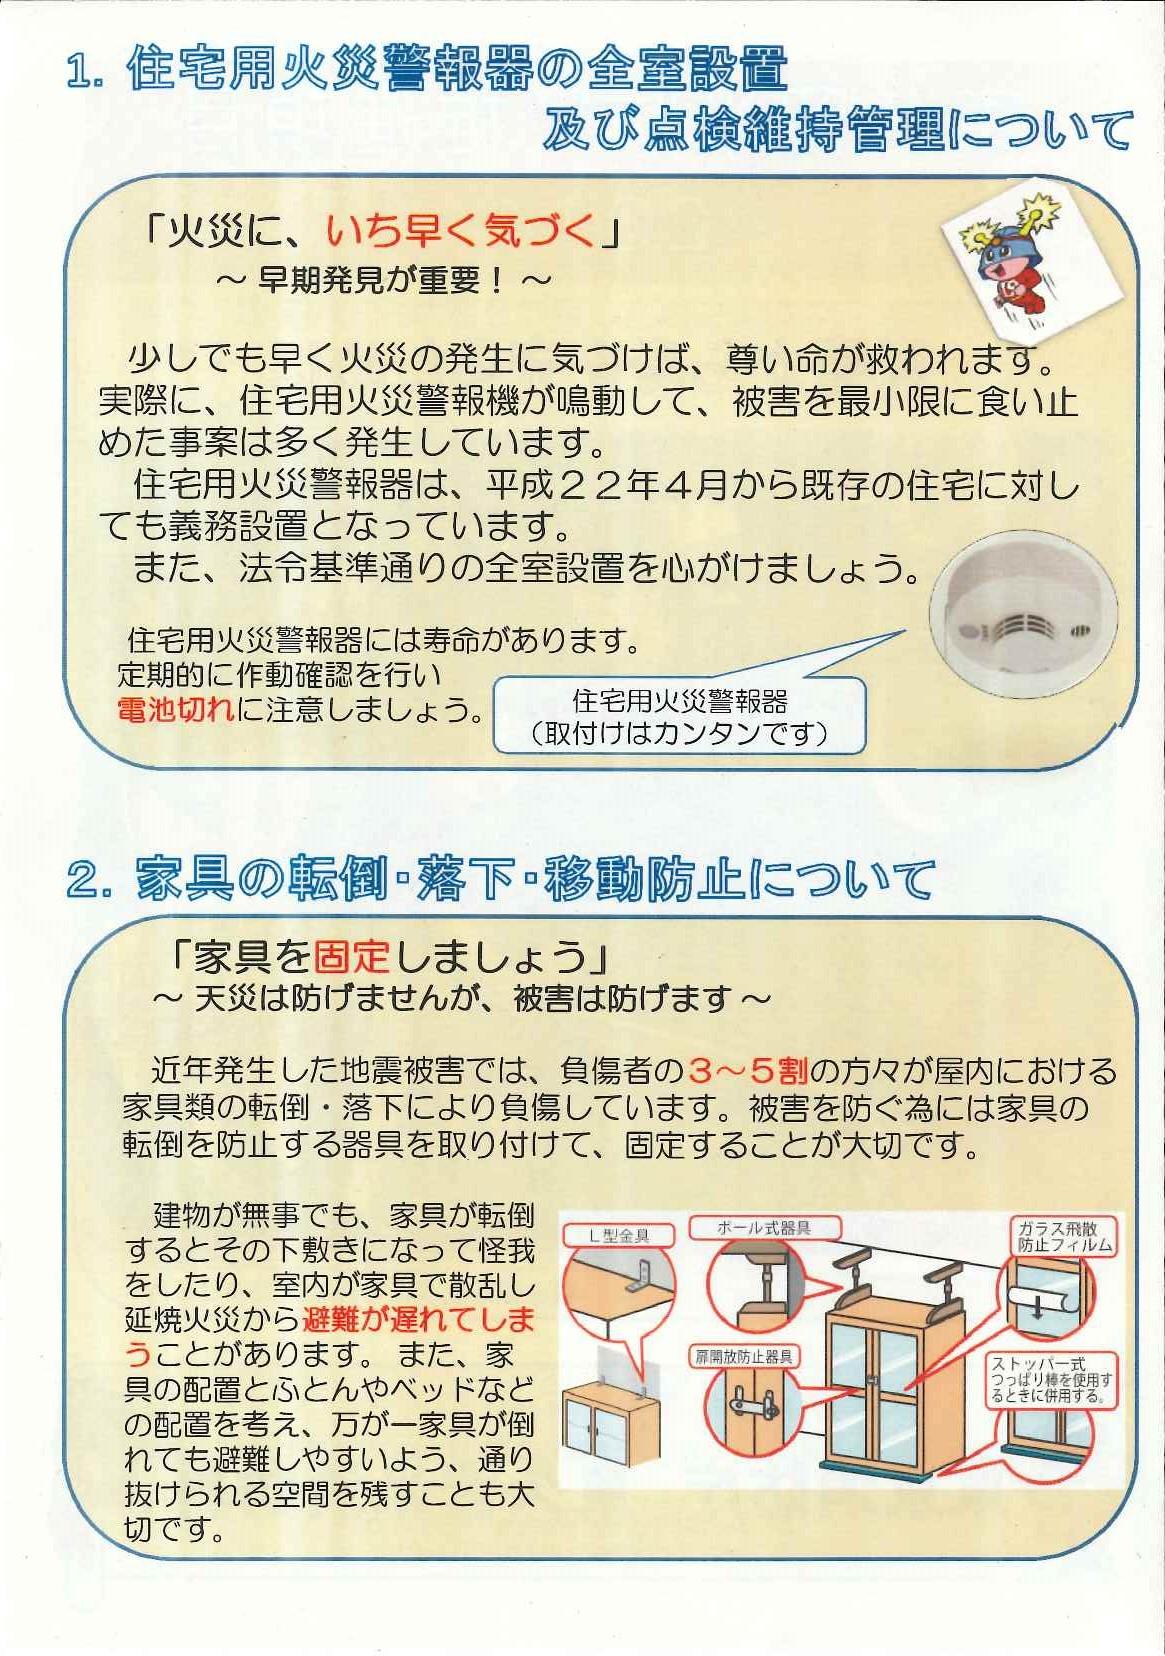 H261017消防防災推進項目配布資料 (1)